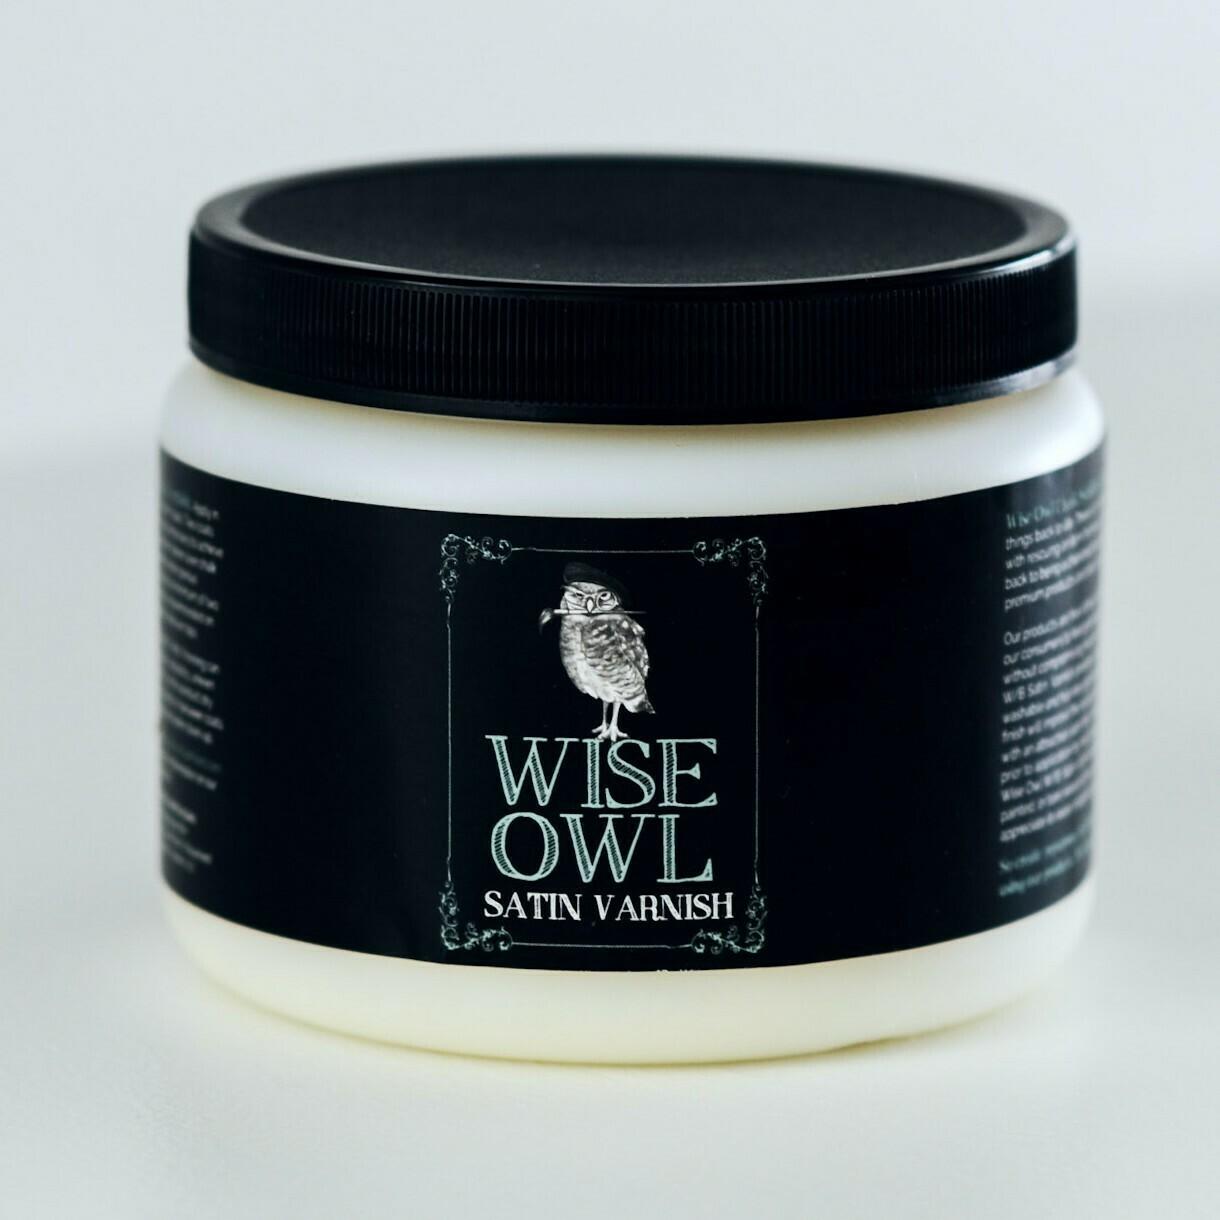 32 Oz Wise Owl Satin Varnish